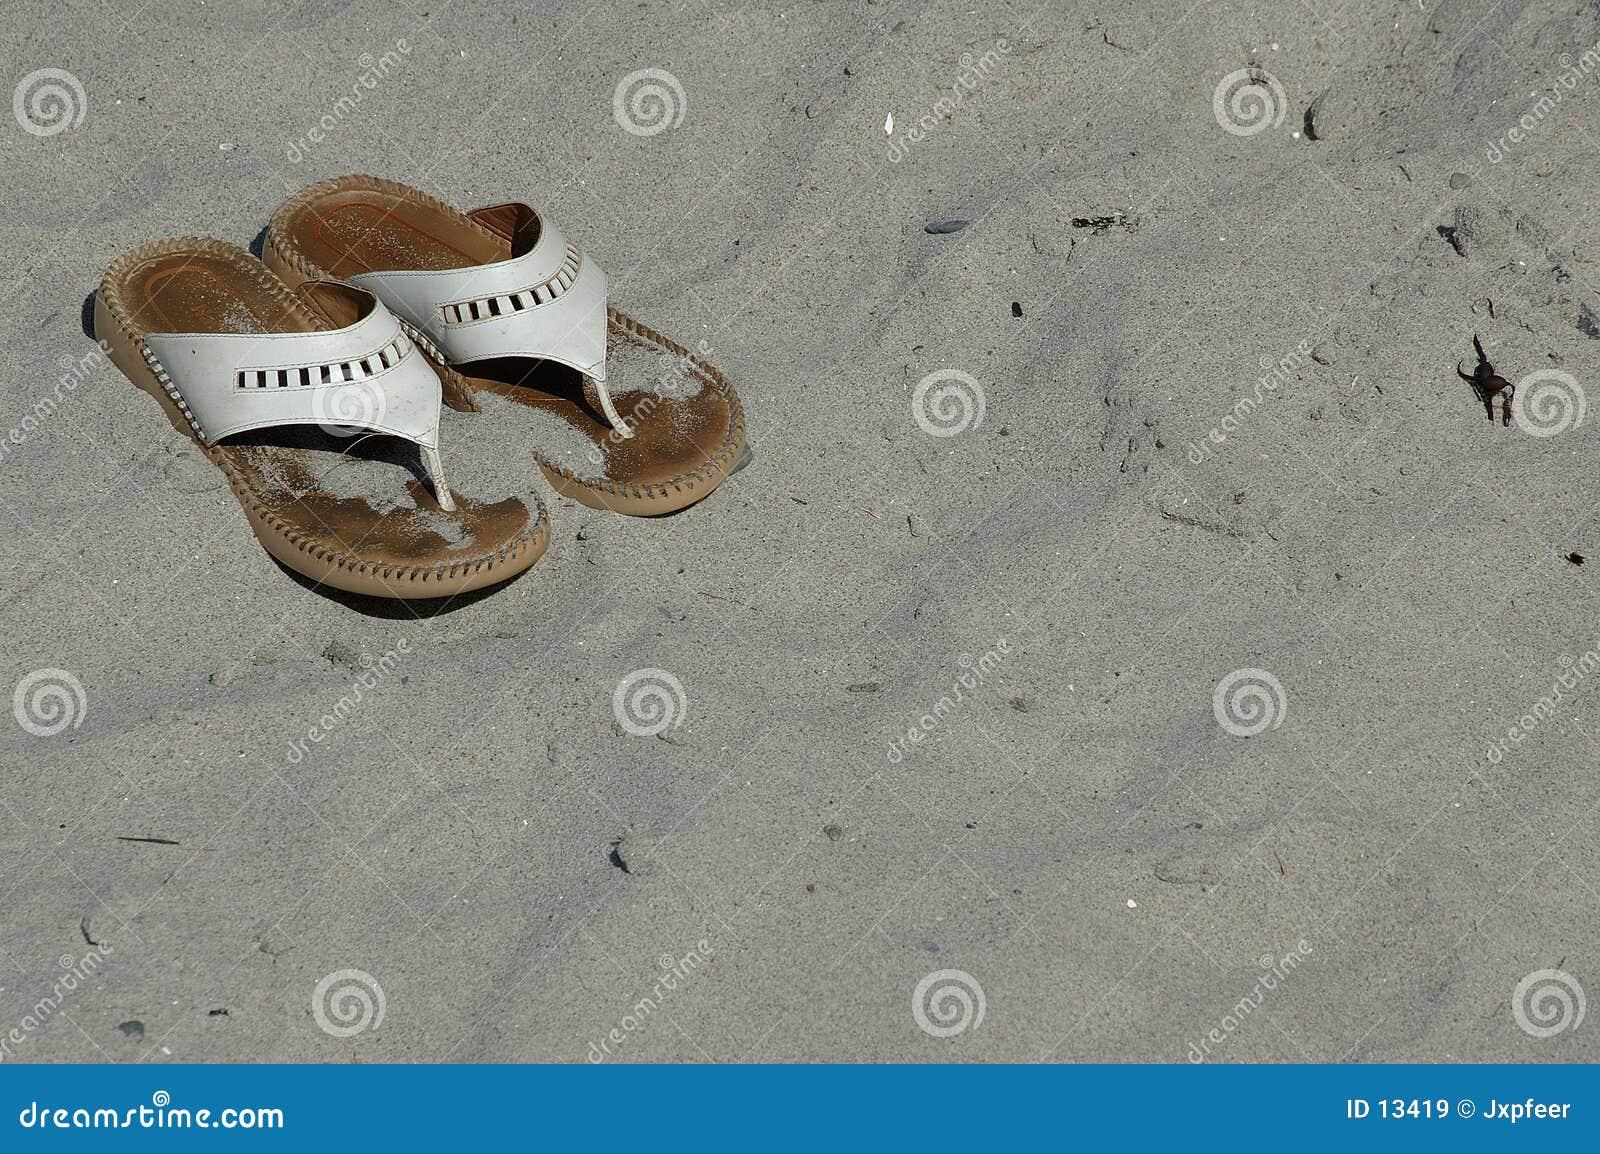 Strandsandals